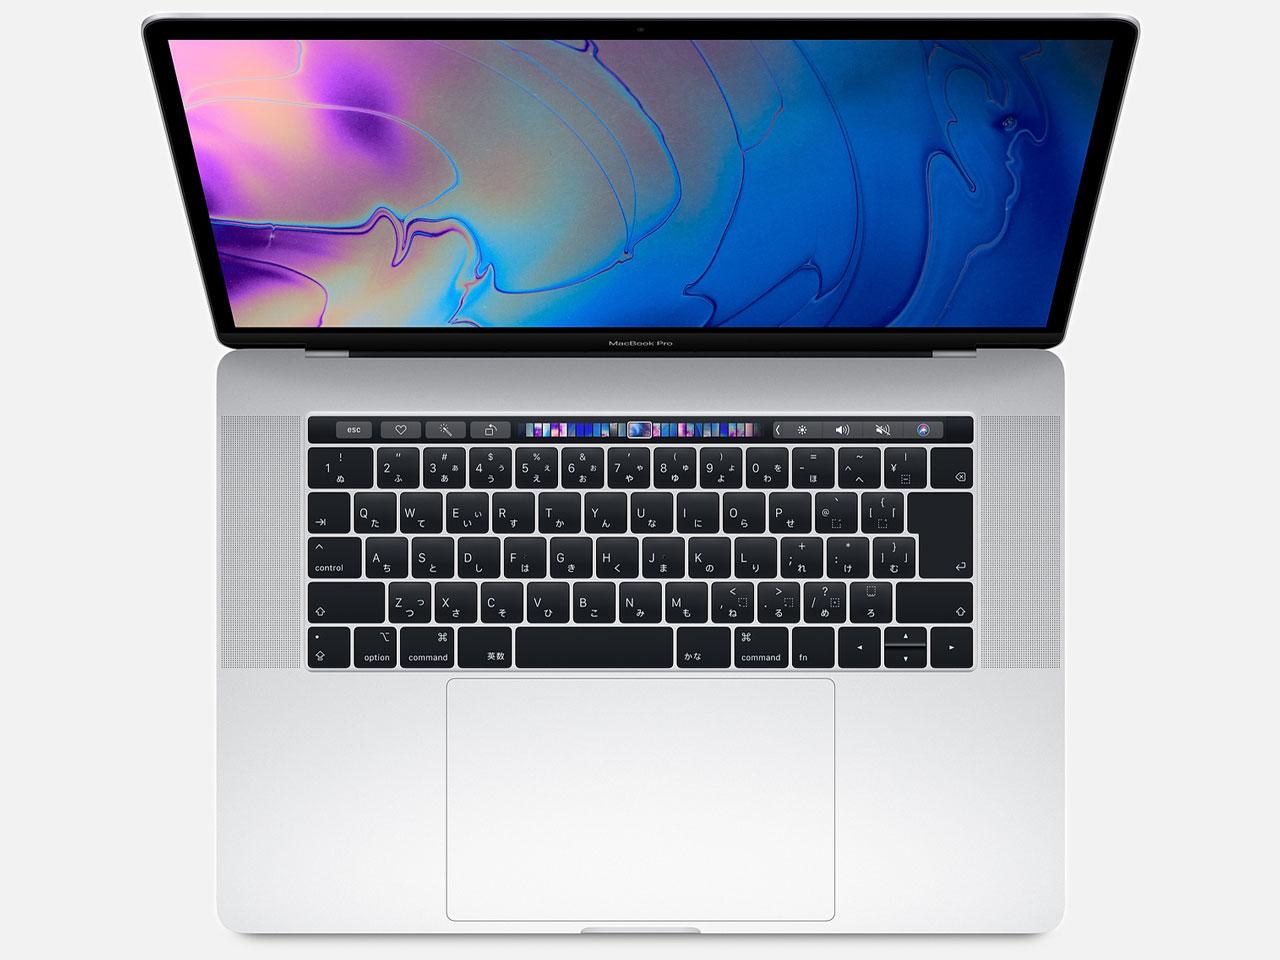 MacBook Pro Retinaディスプレイ 2200/15.4 MR962J/A [シルバー] apple//